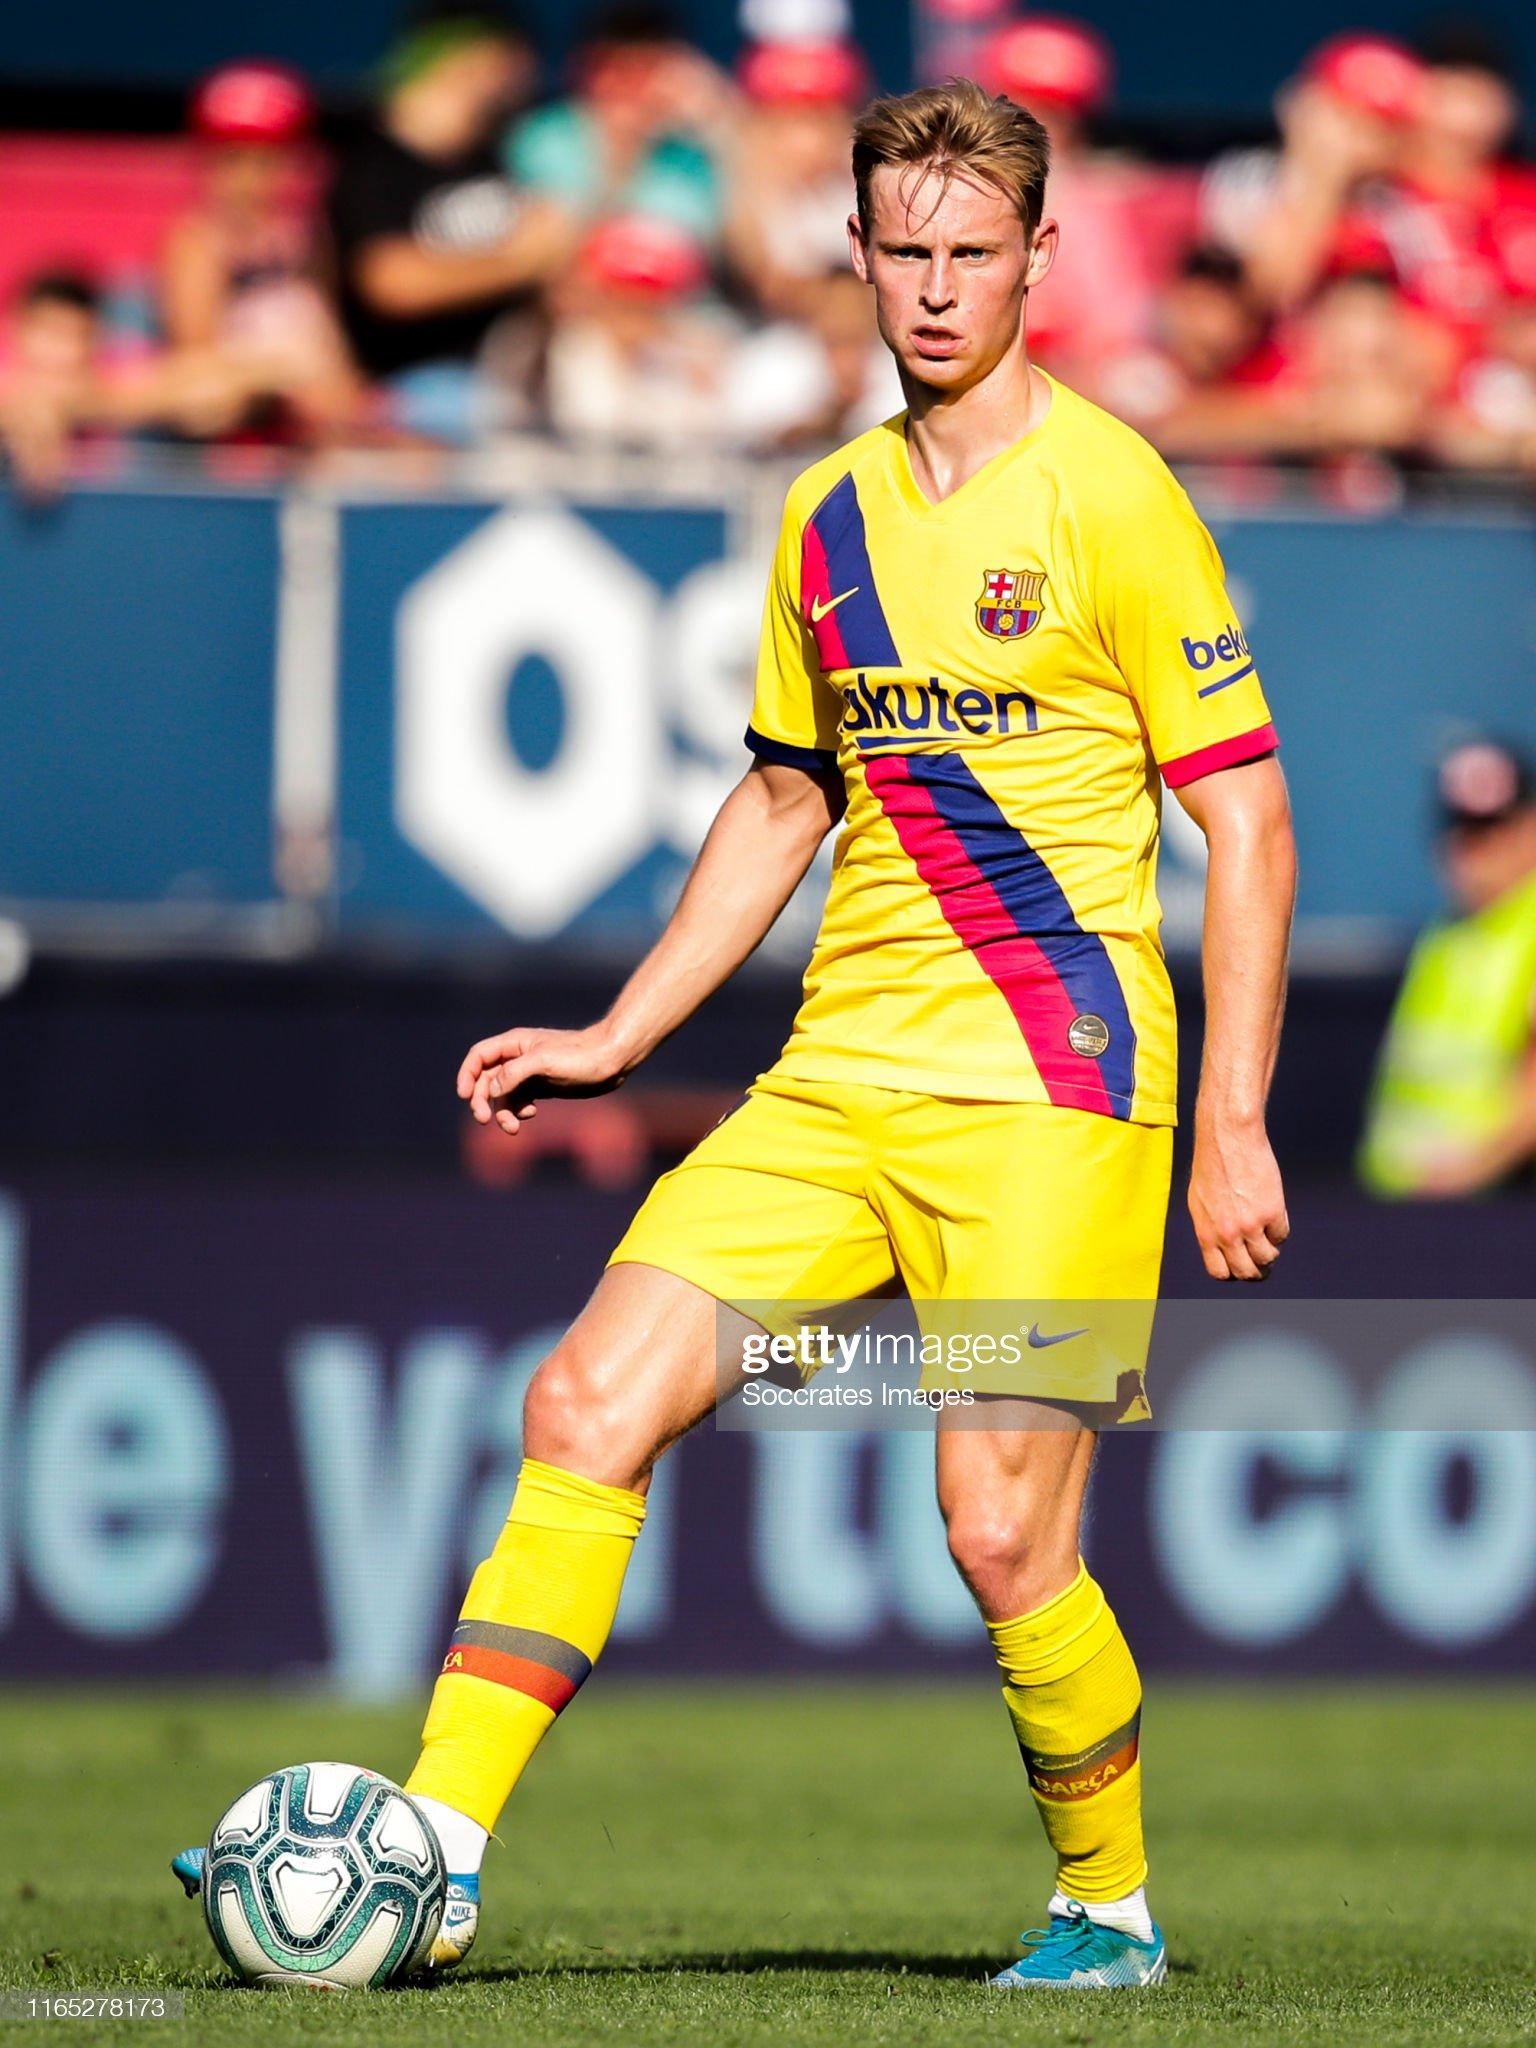 صور مباراة : أوساسونا - برشلونة 2-2 ( 31-08-2019 )  Frenkie-de-jong-of-fc-barcelona-during-the-la-liga-santander-match-picture-id1165278173?s=2048x2048